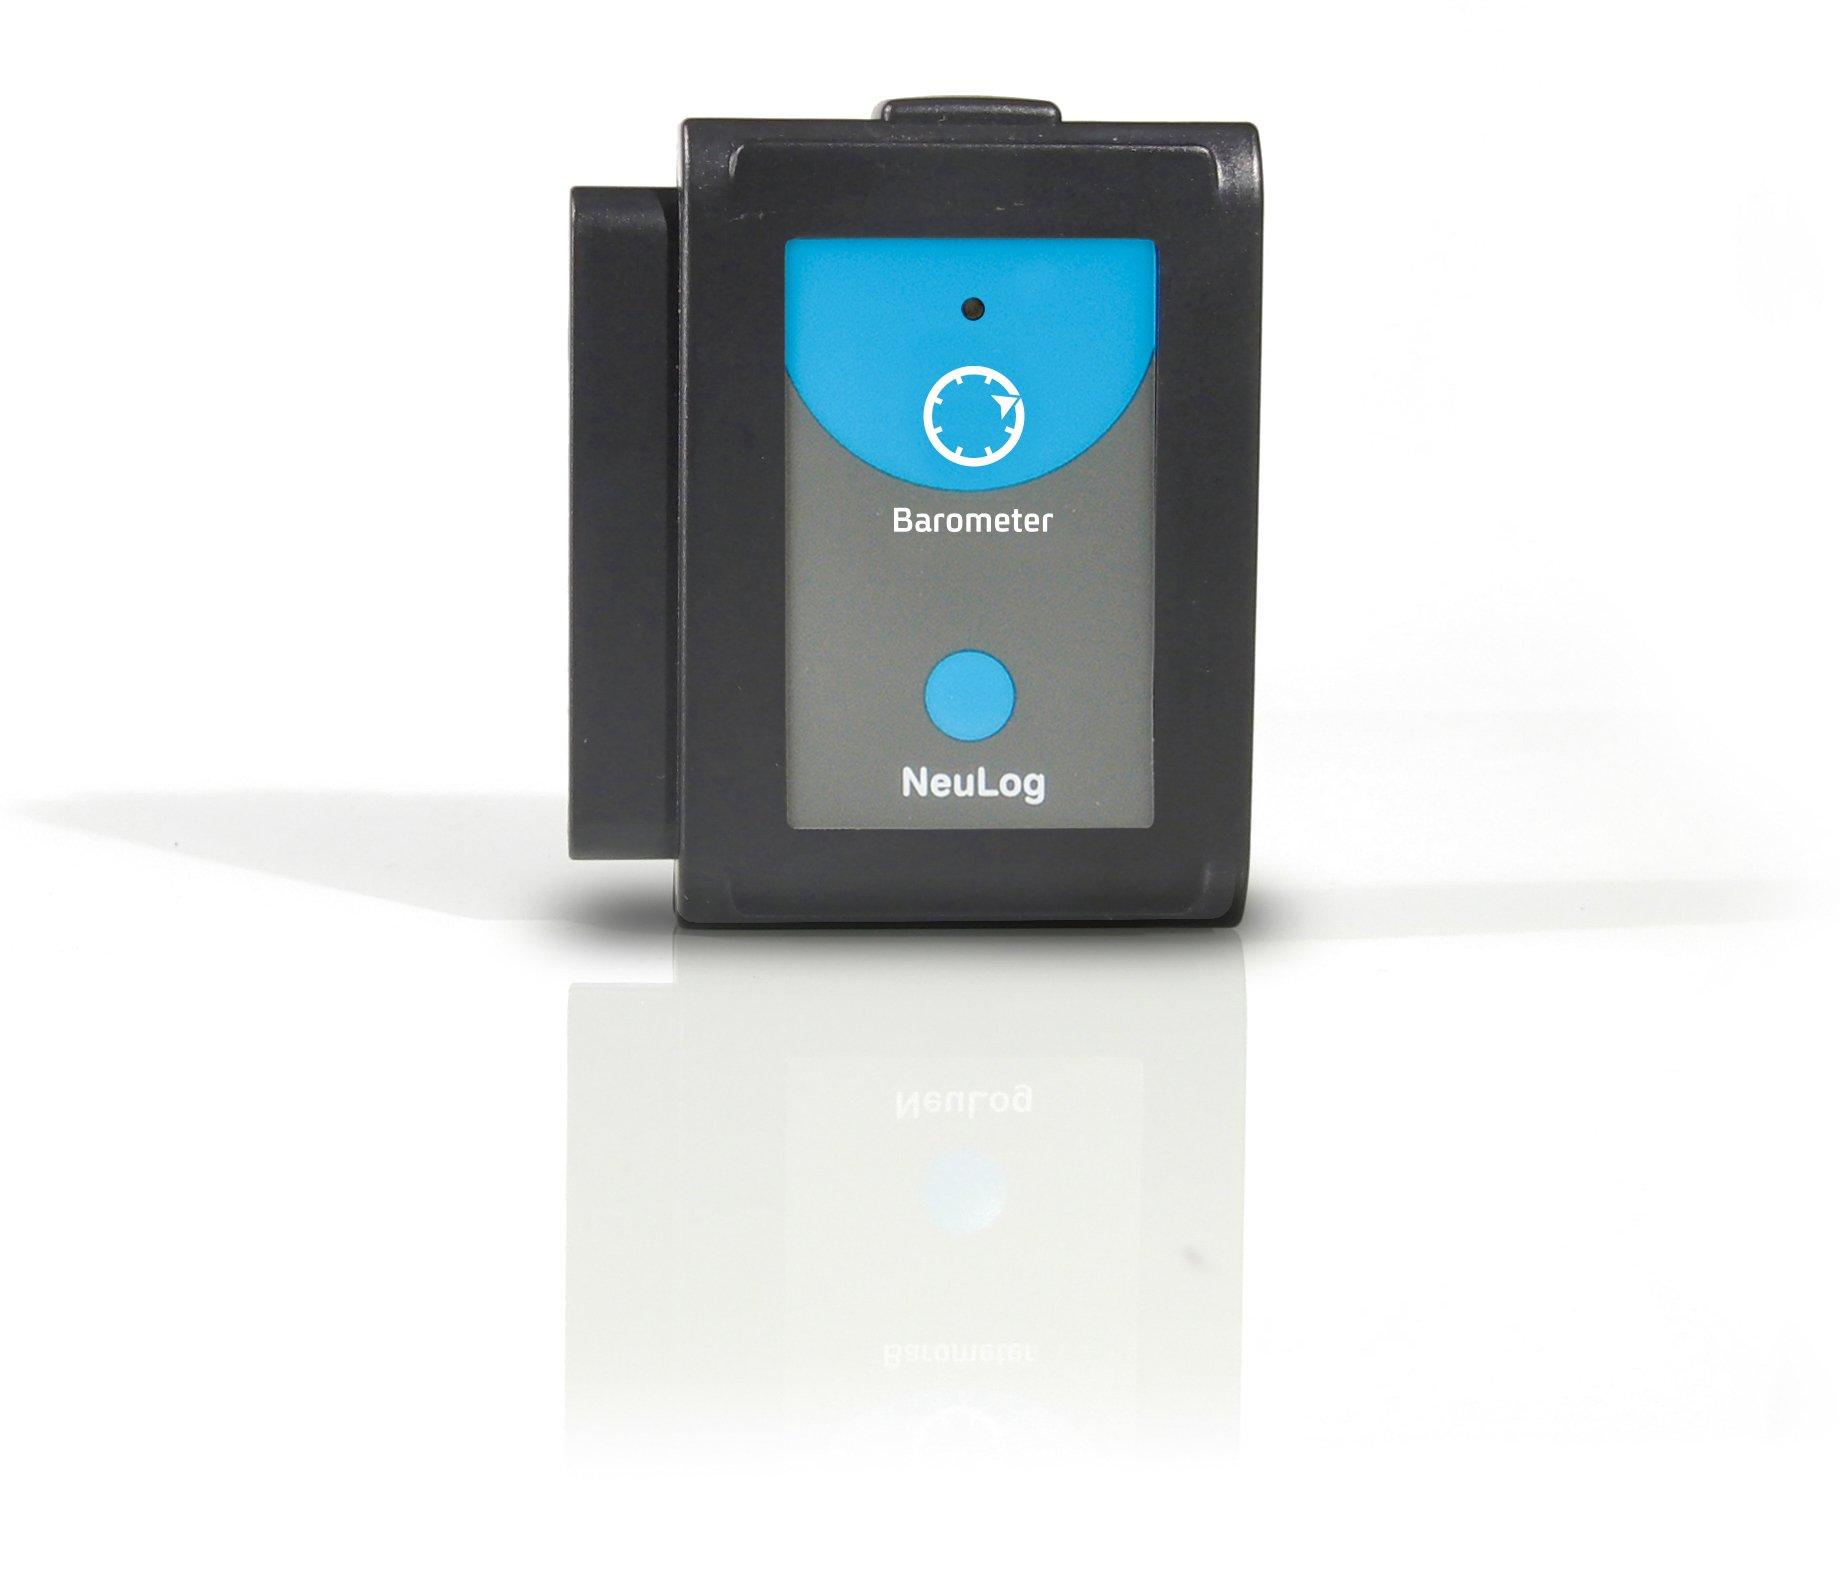 NEULOG Barometer Logger Sensor, 15 bit ADC Resolution